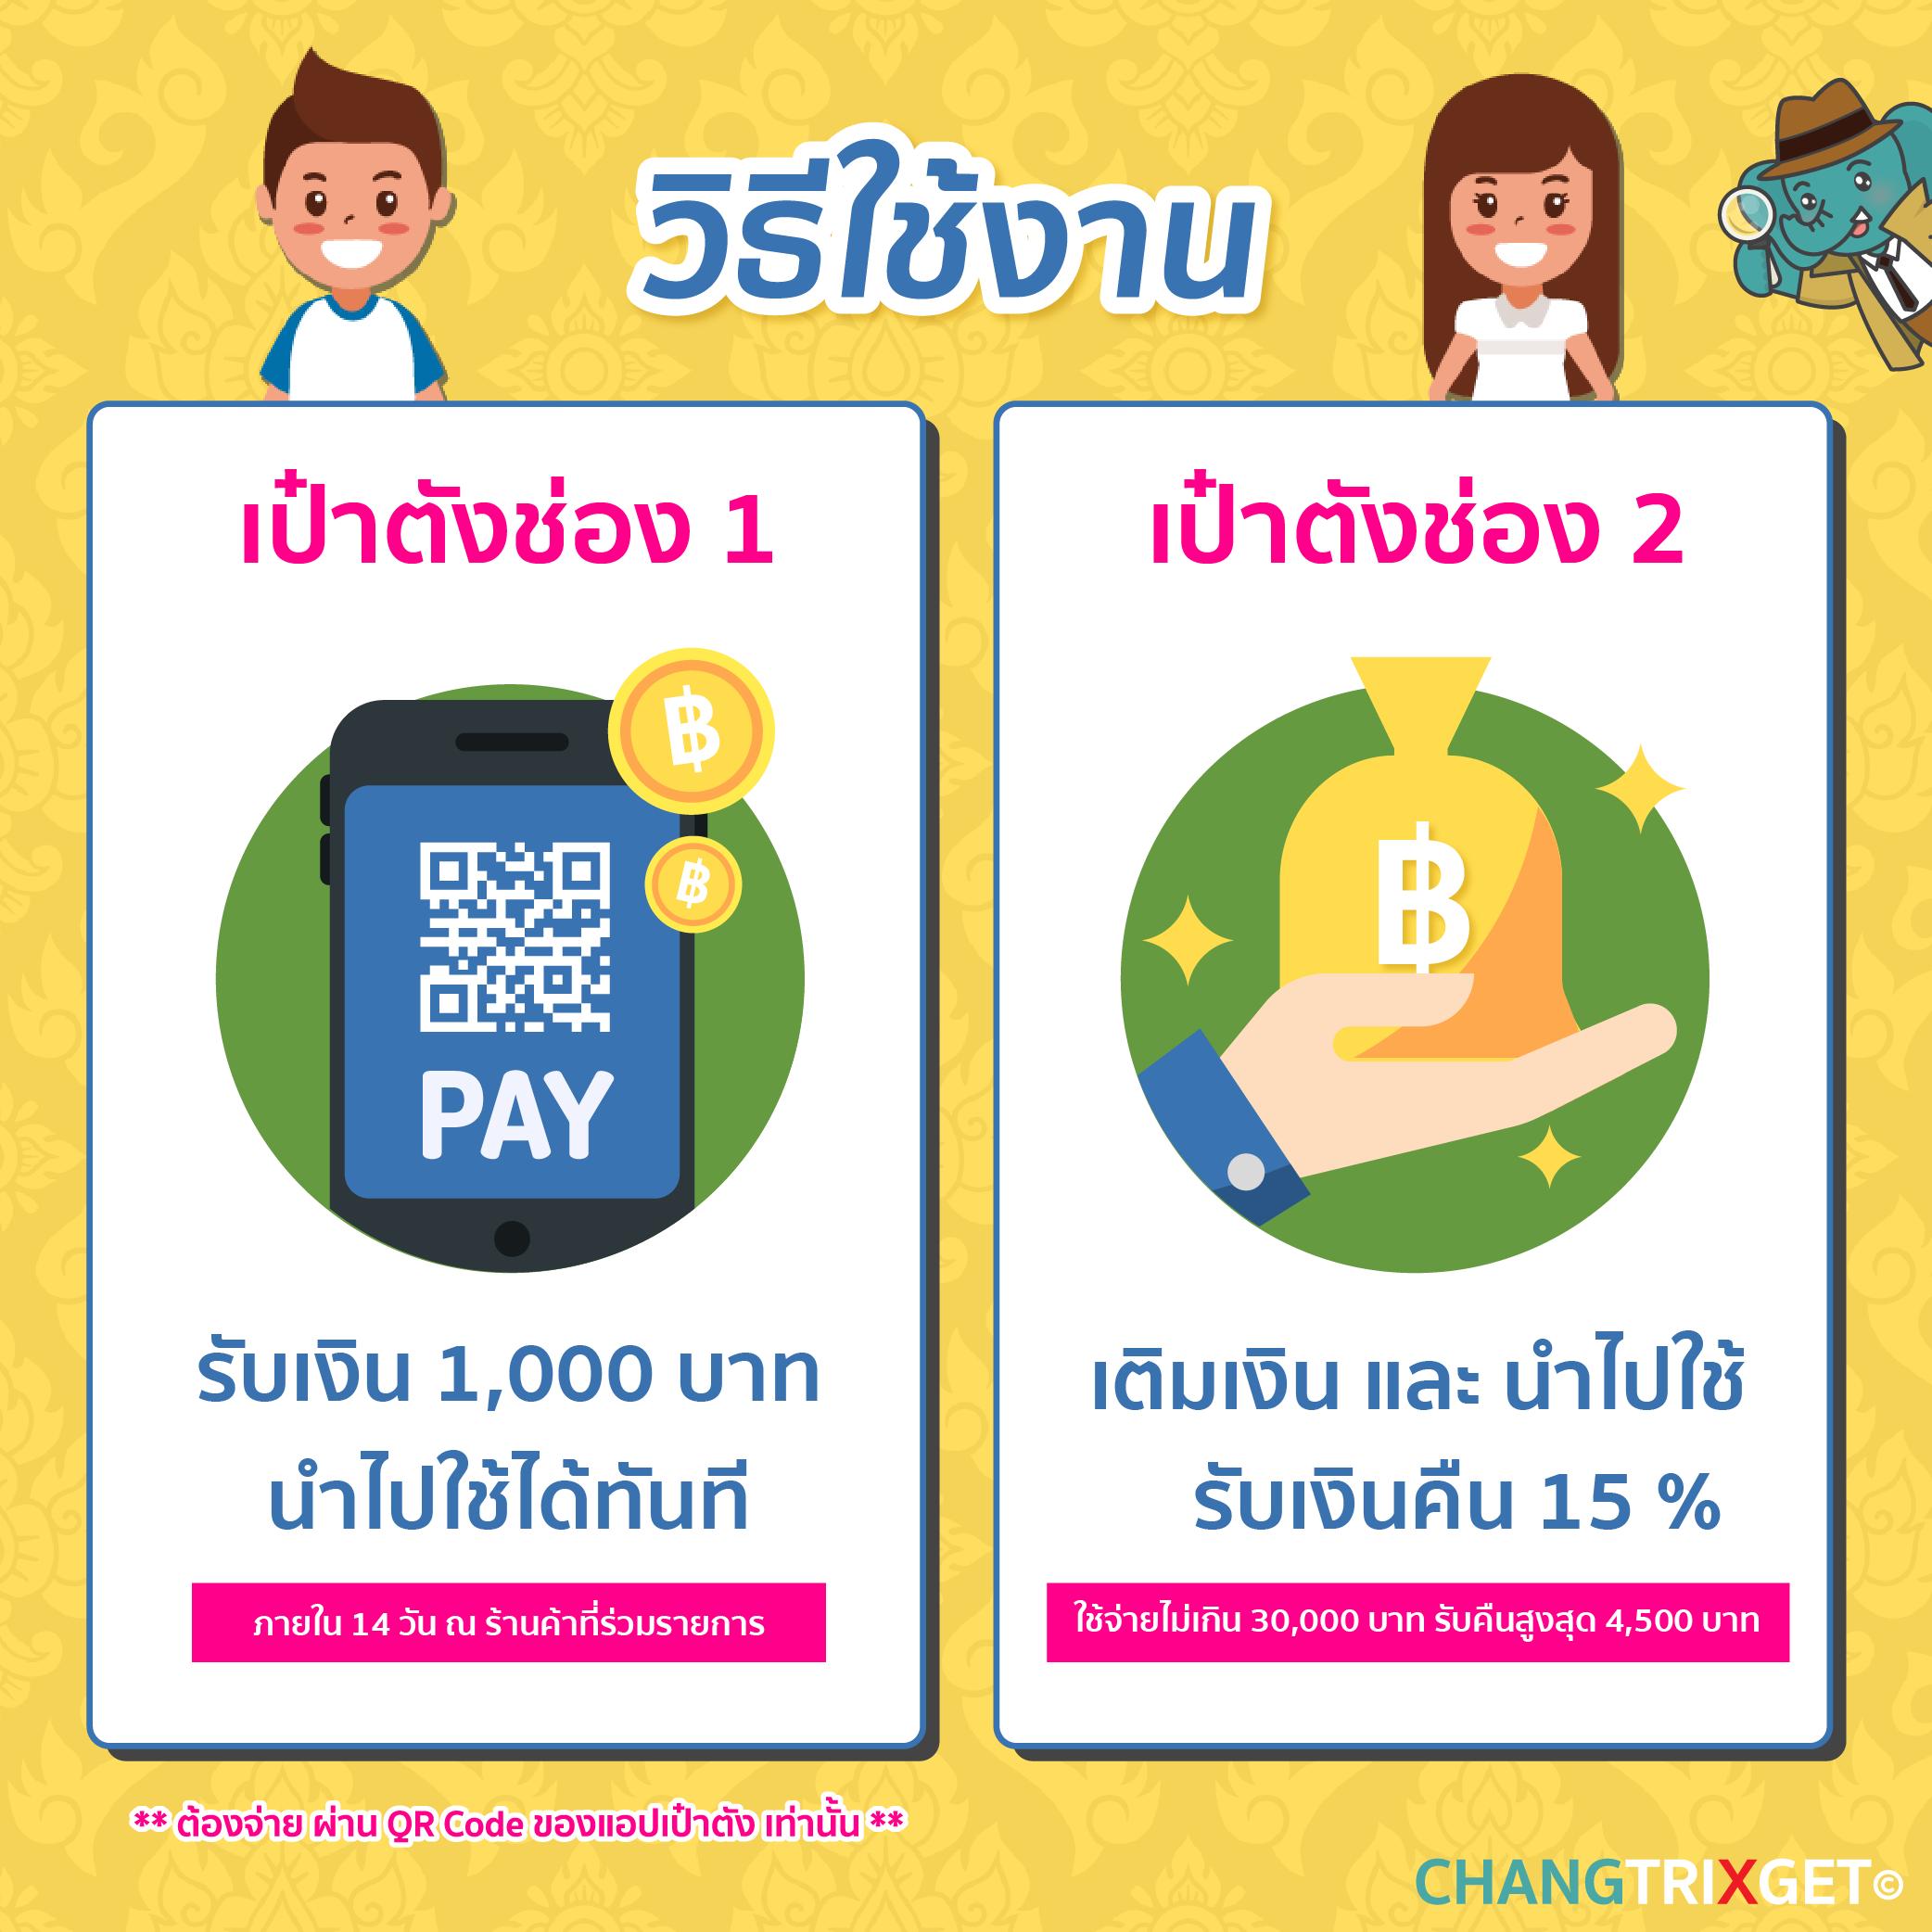 use-free-1000-baht-travel-free-Ministry of Finance- กระทรวงการคลัง เงินท่องเที่ยว ชิมช้อปใช้